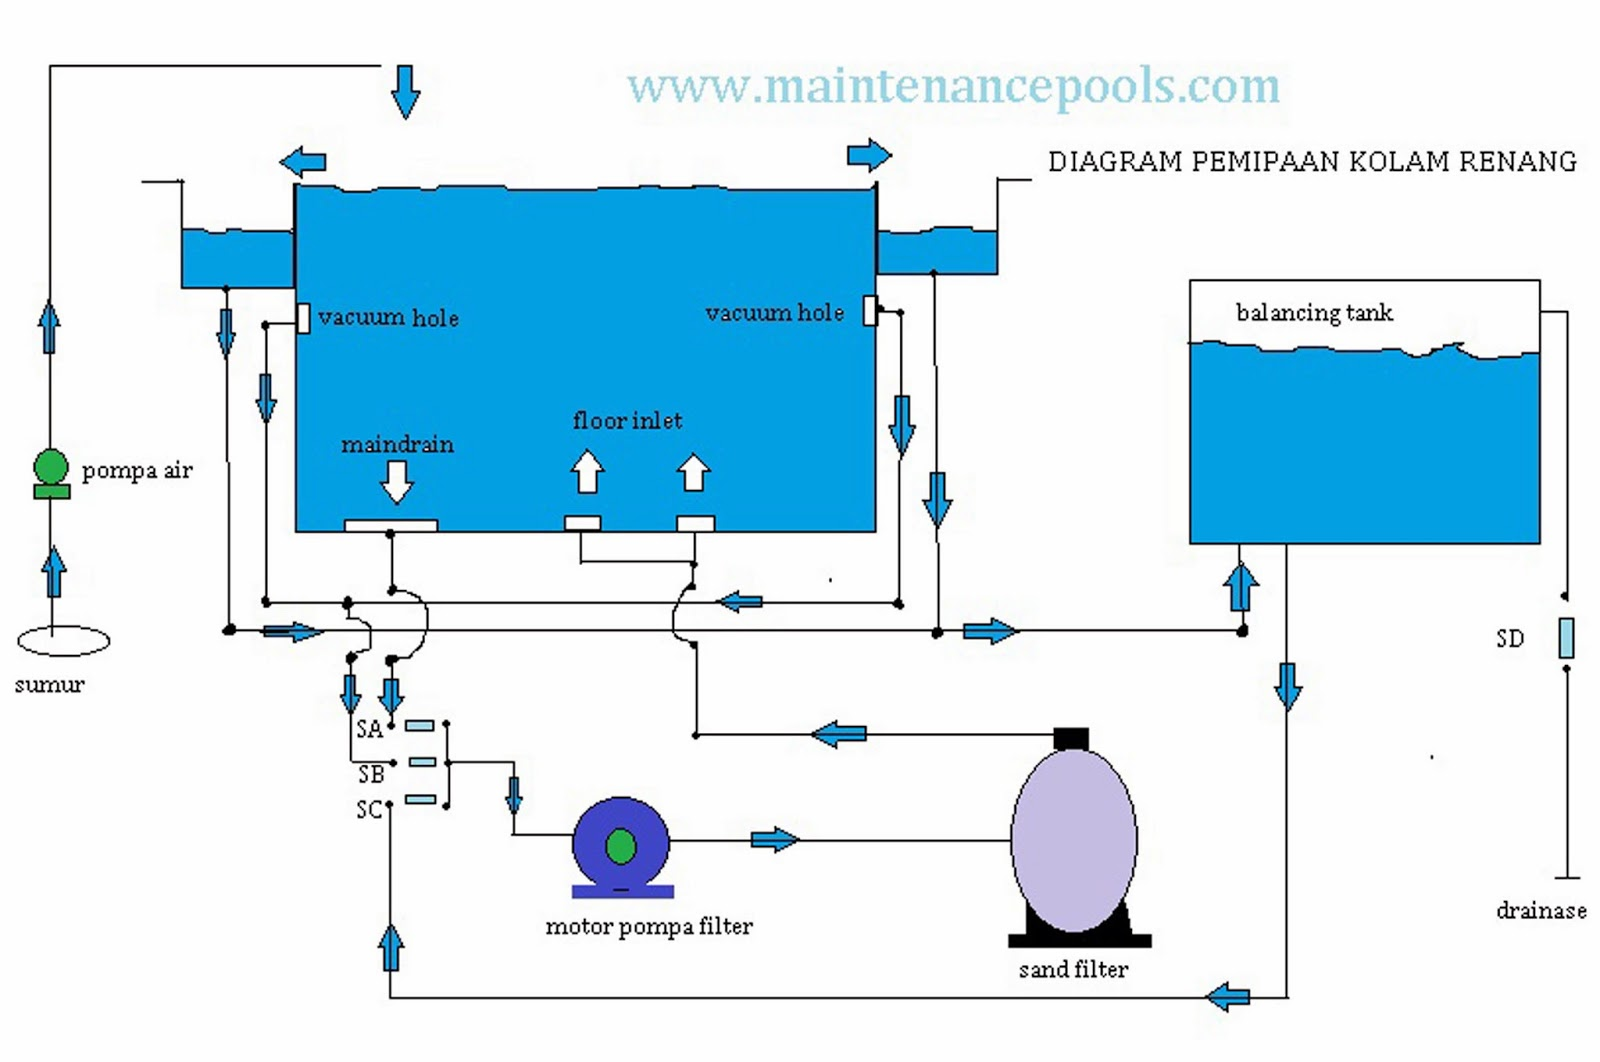 swimming pool water flow diagram ford spark plug wire hayward 2 sd pump wiring super